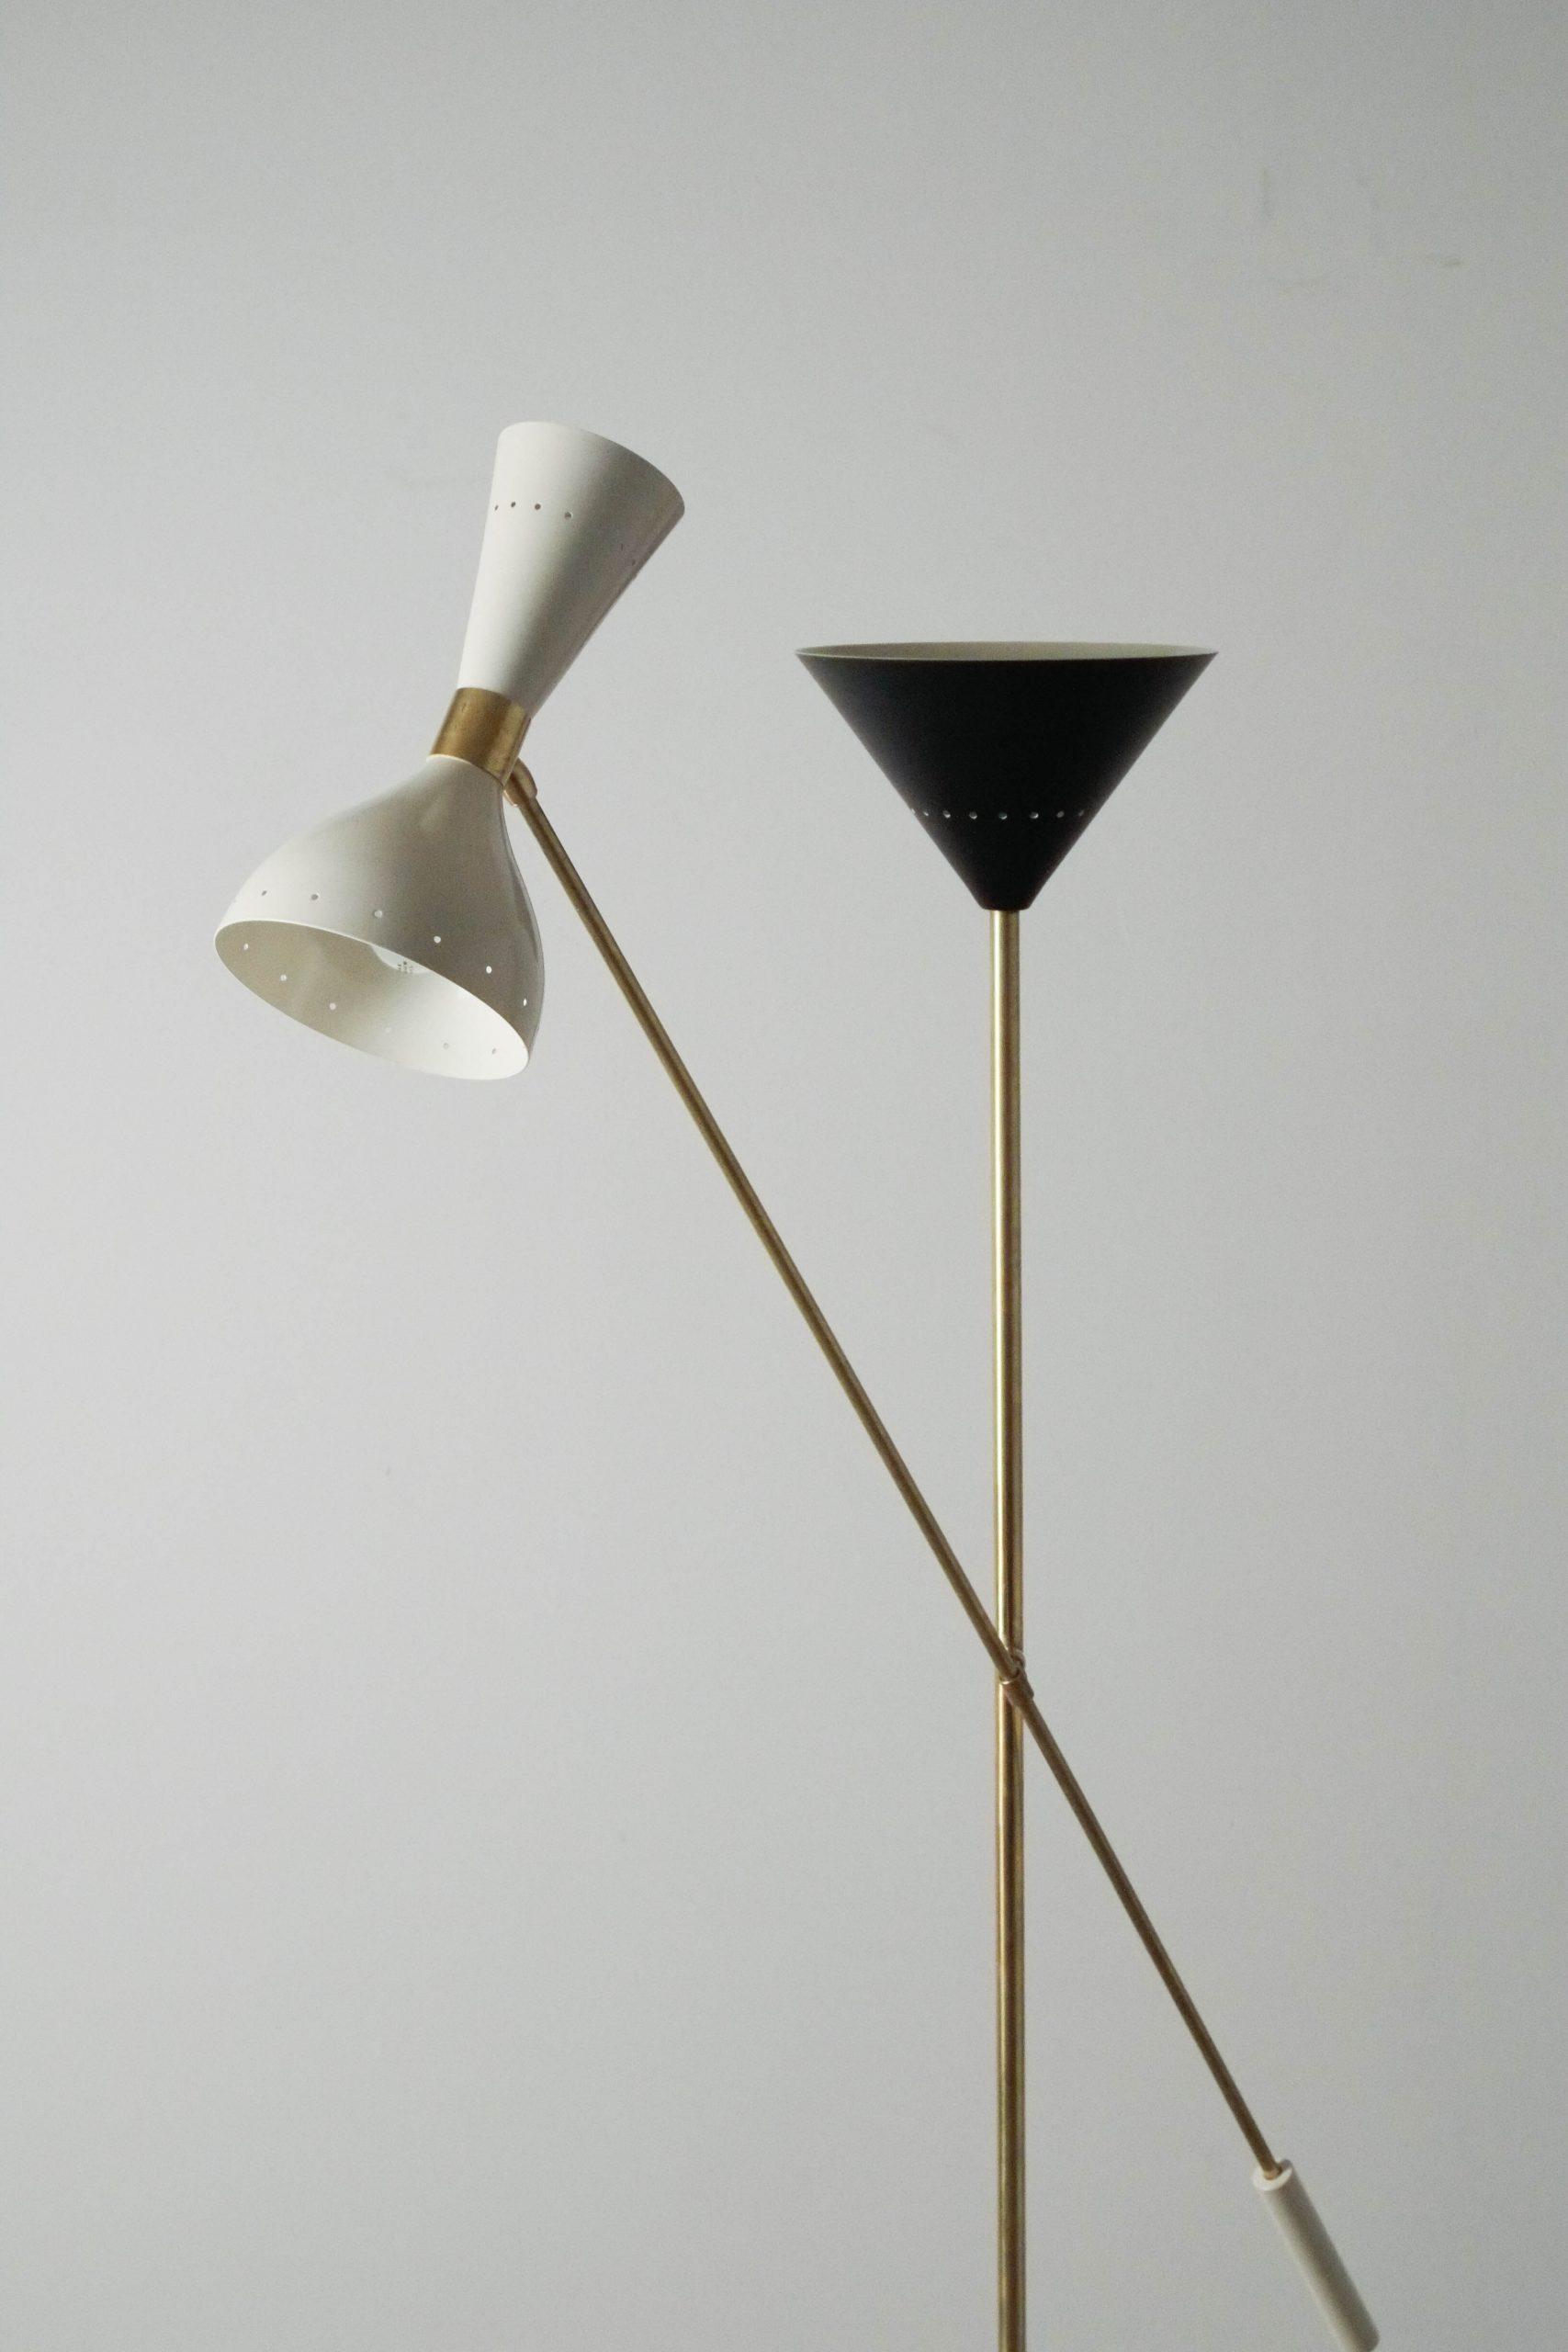 lampara esbelta de laton elegante de diseño